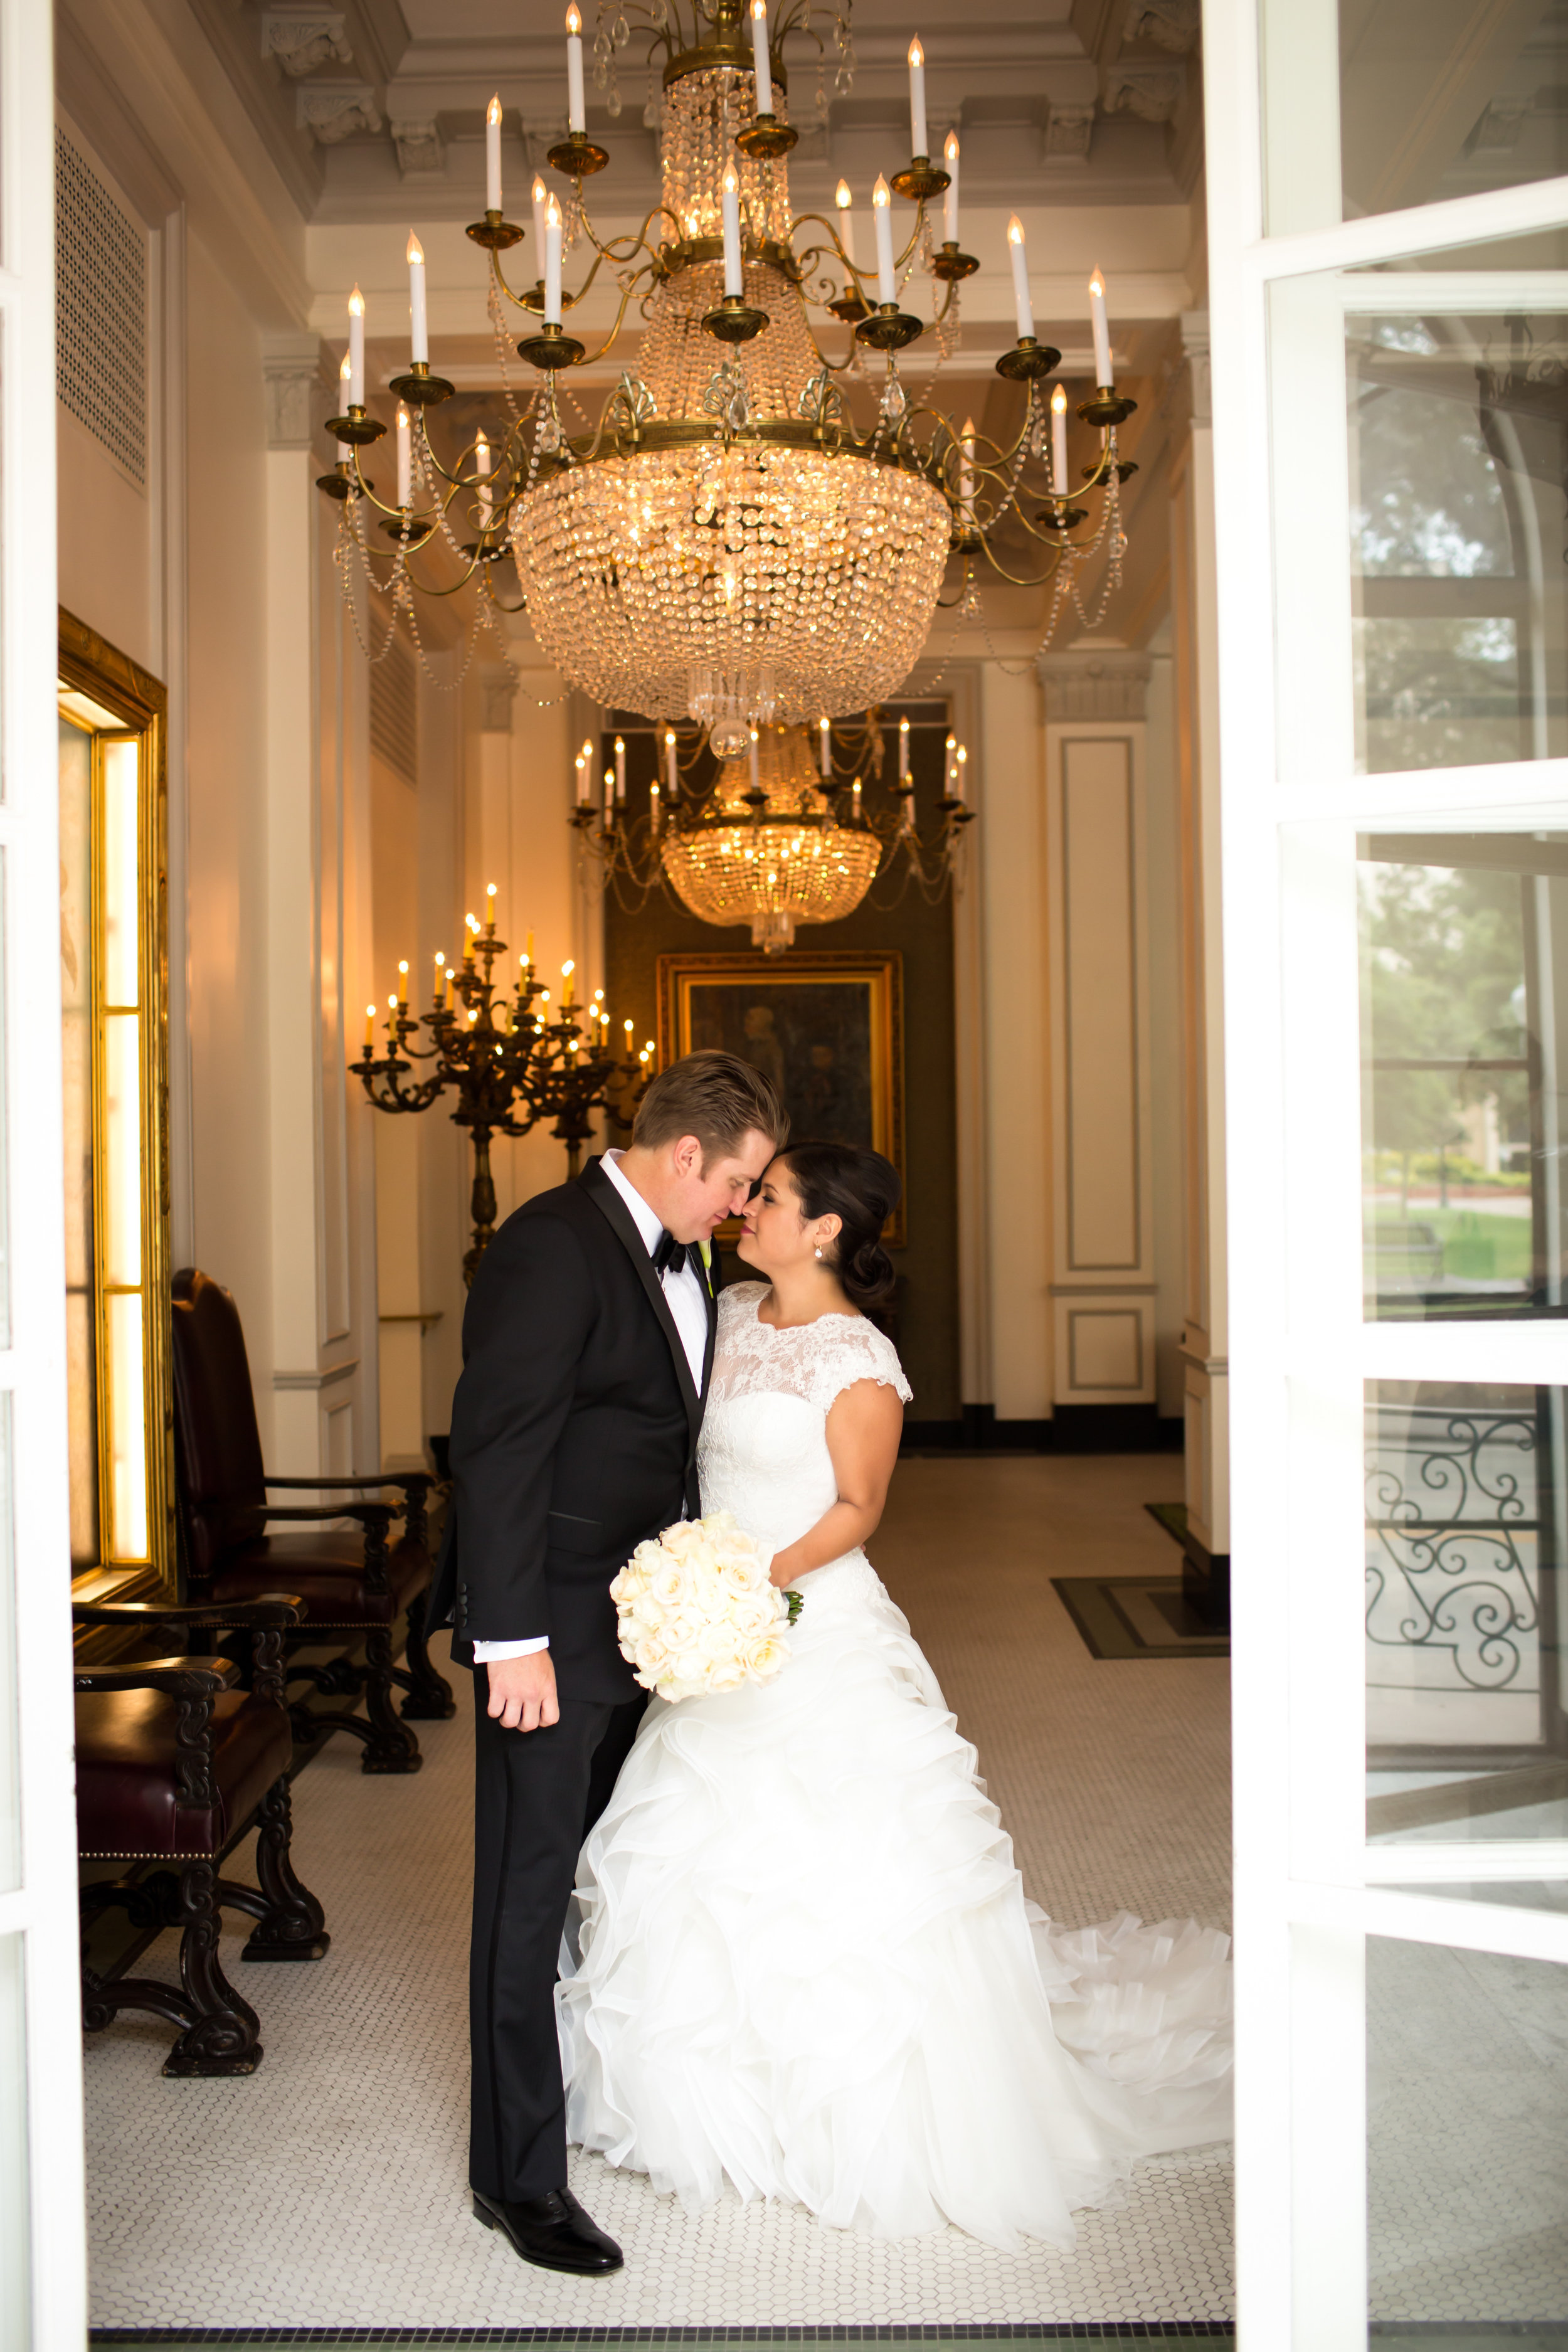 Marble_Falls_Horseshoe_Bay_Photographer_Torres_Wedding_19.jpg